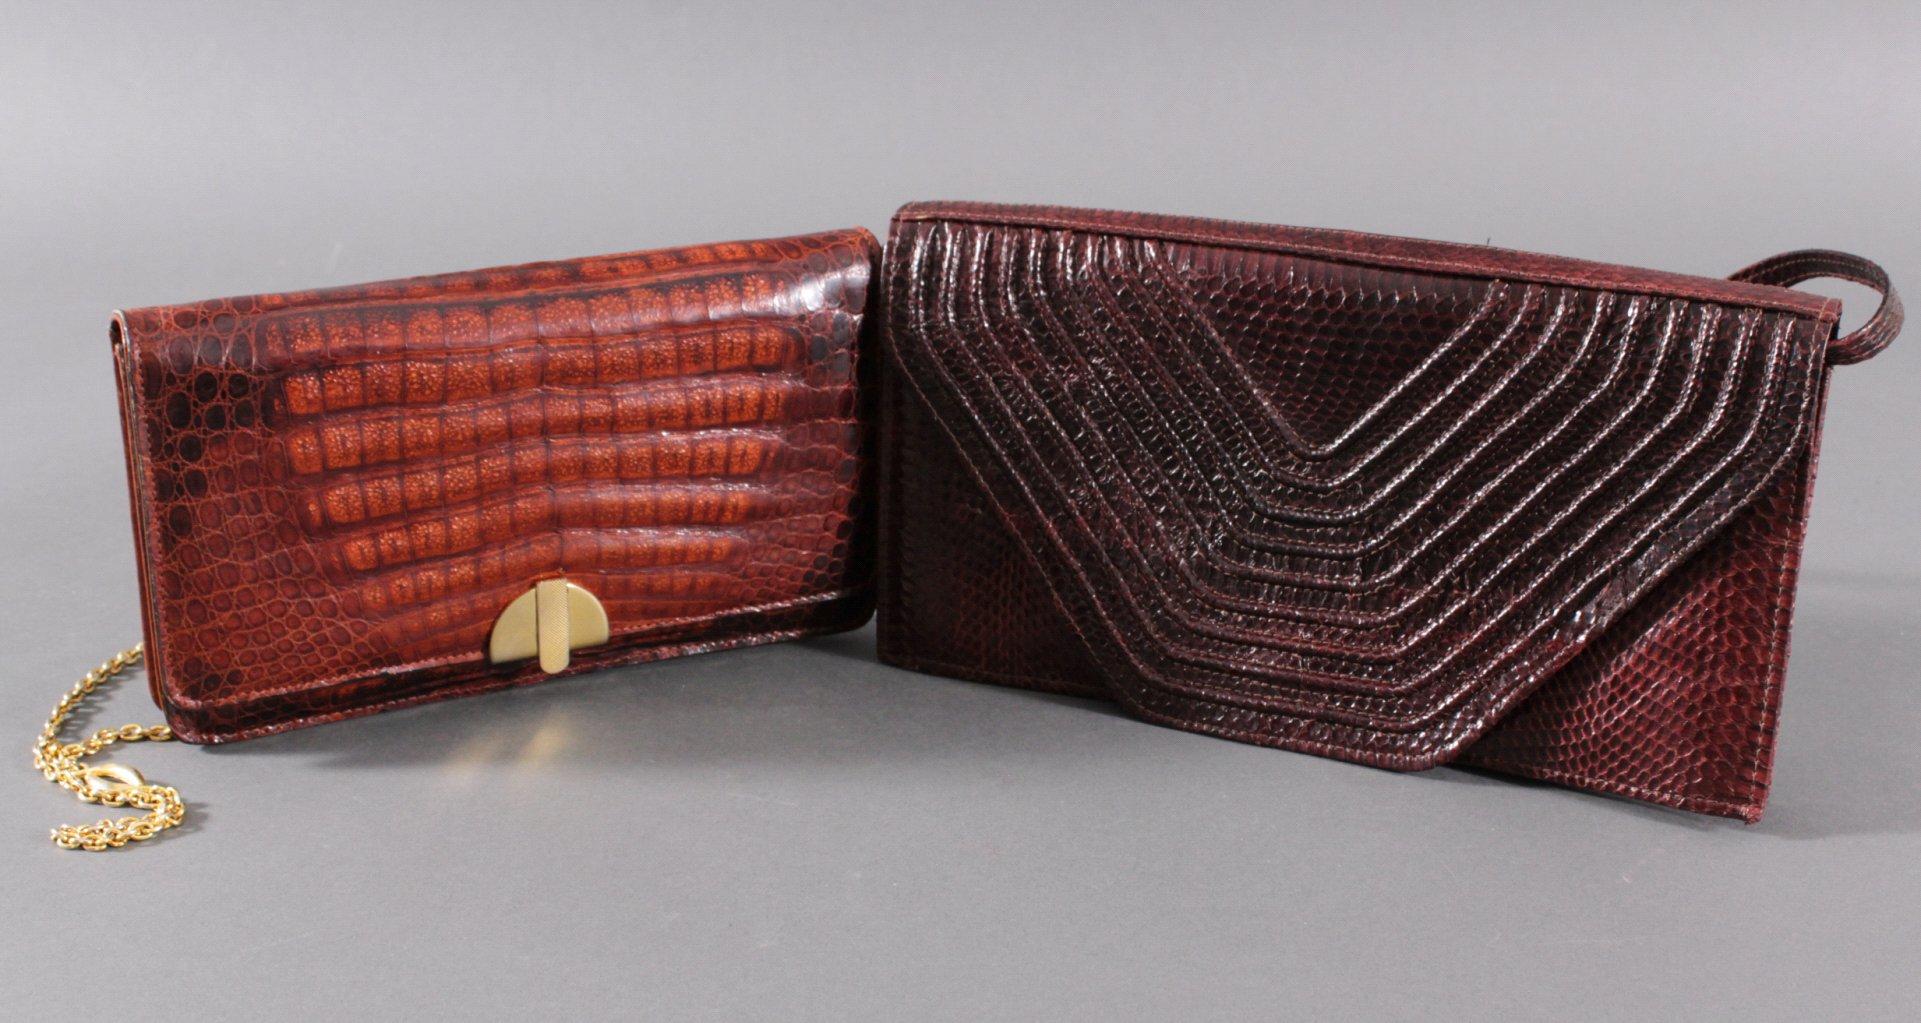 2 Damenhandtaschen aus Krokodilleder